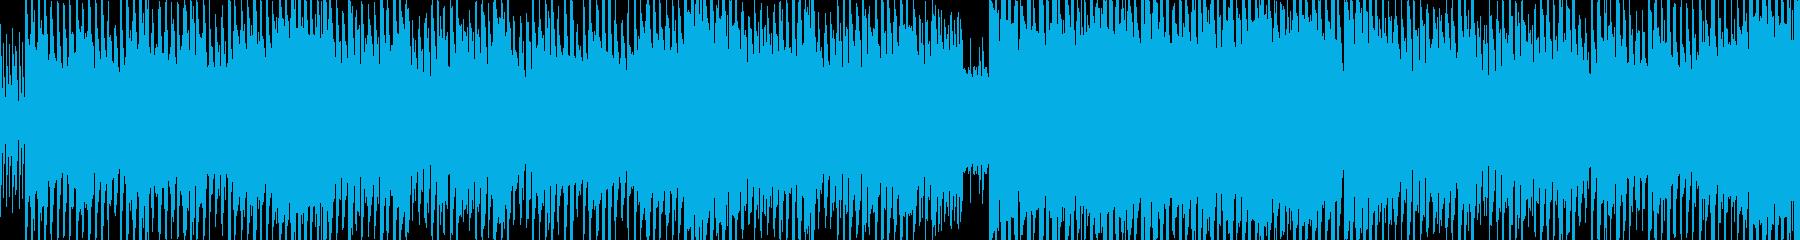 BGM、ゲーム、ダンスミュージックに最適の再生済みの波形